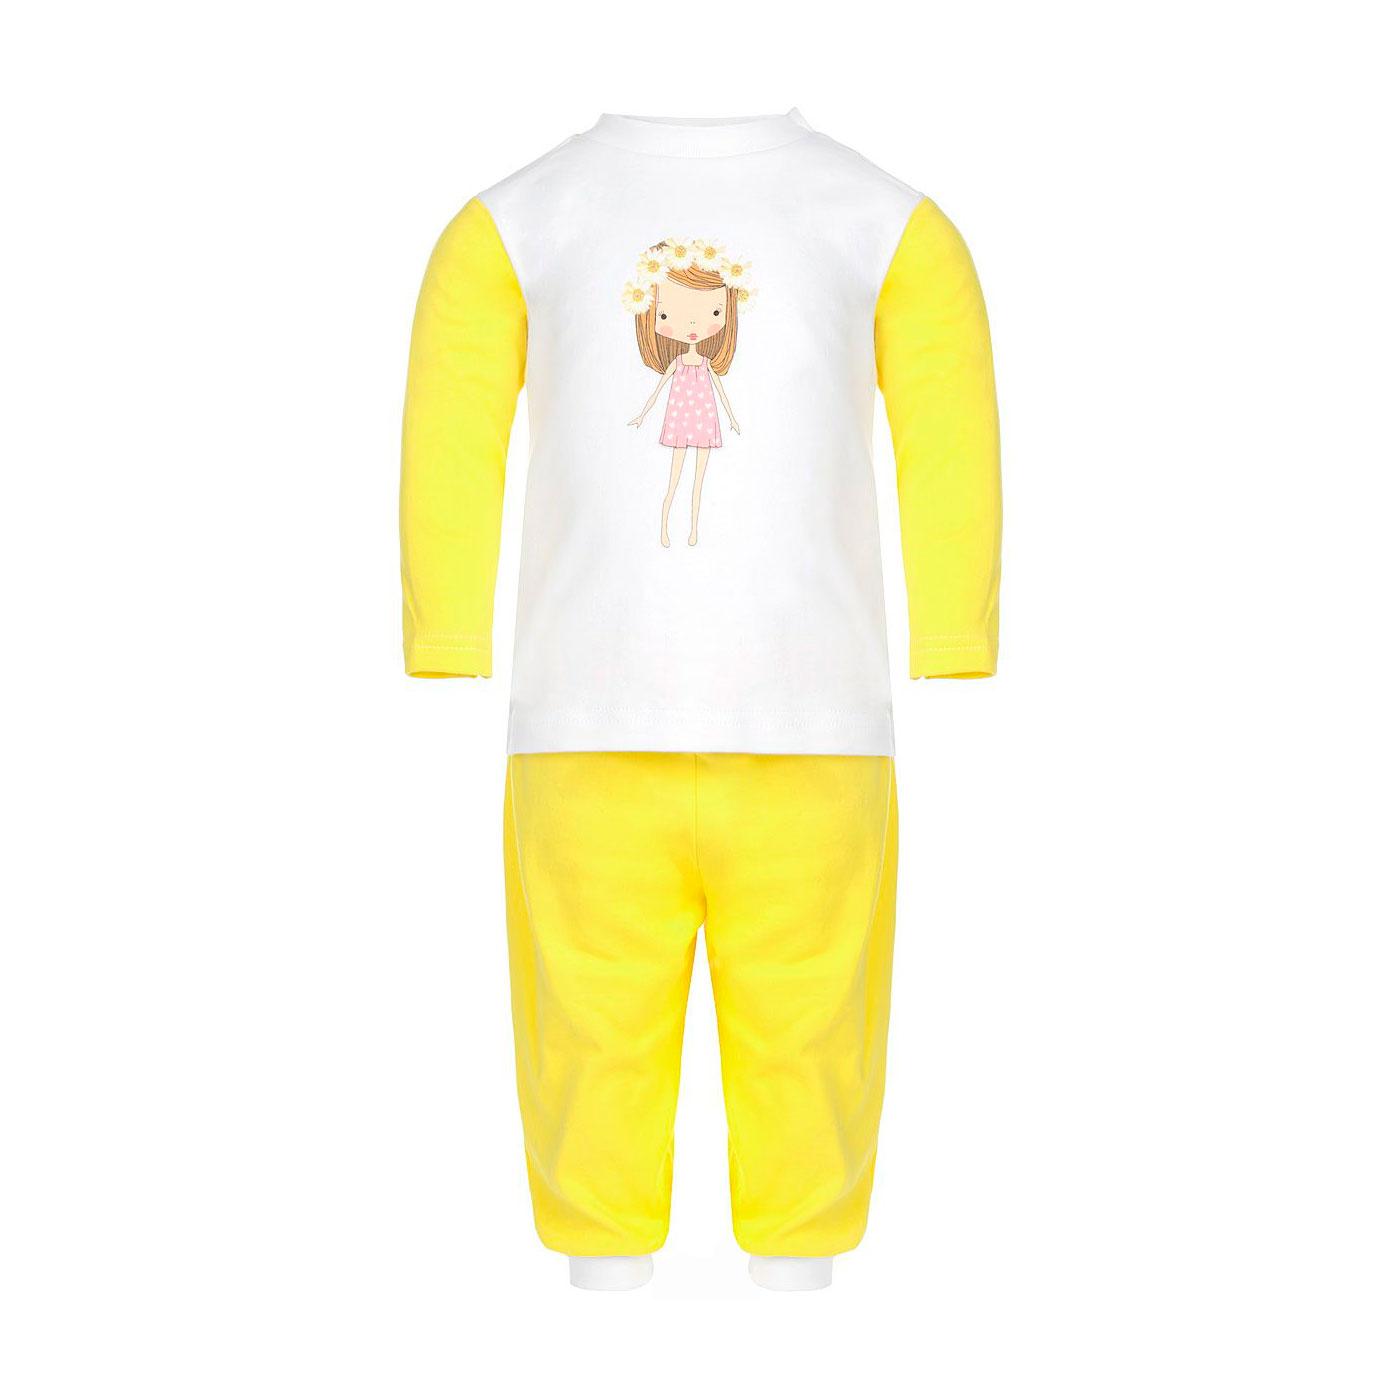 Пижама Котмаркот Ромашки рост 80 желтый<br>